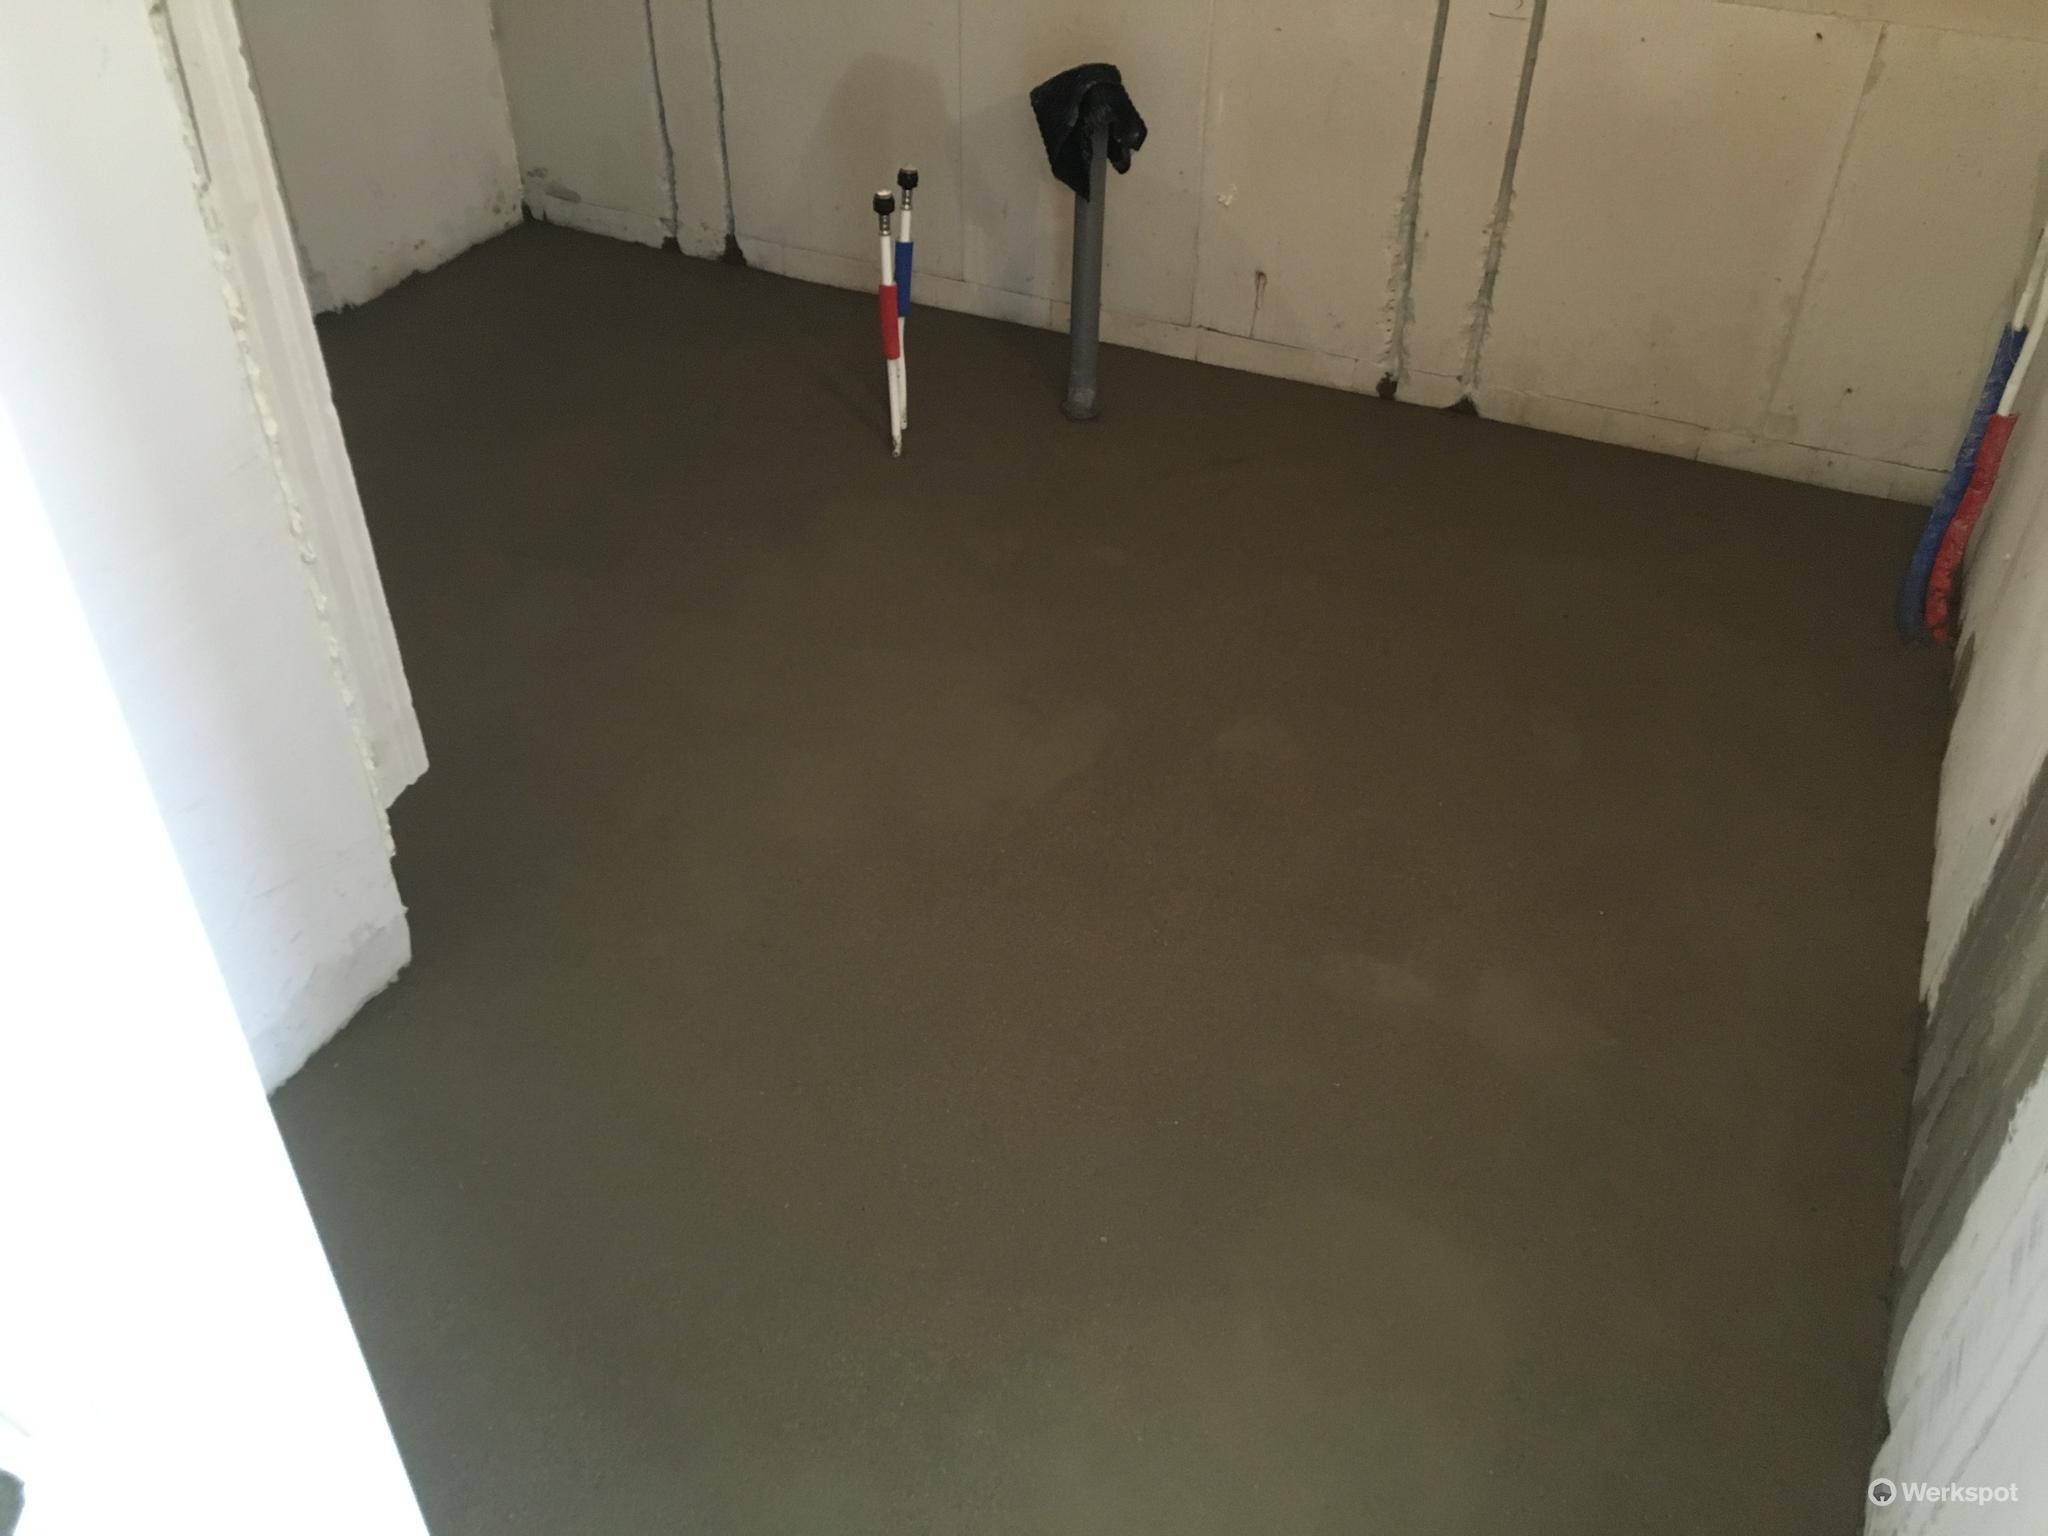 Badkamer Vloer Storten : Zand cement vloer á cm m in badkamer storten werkspot